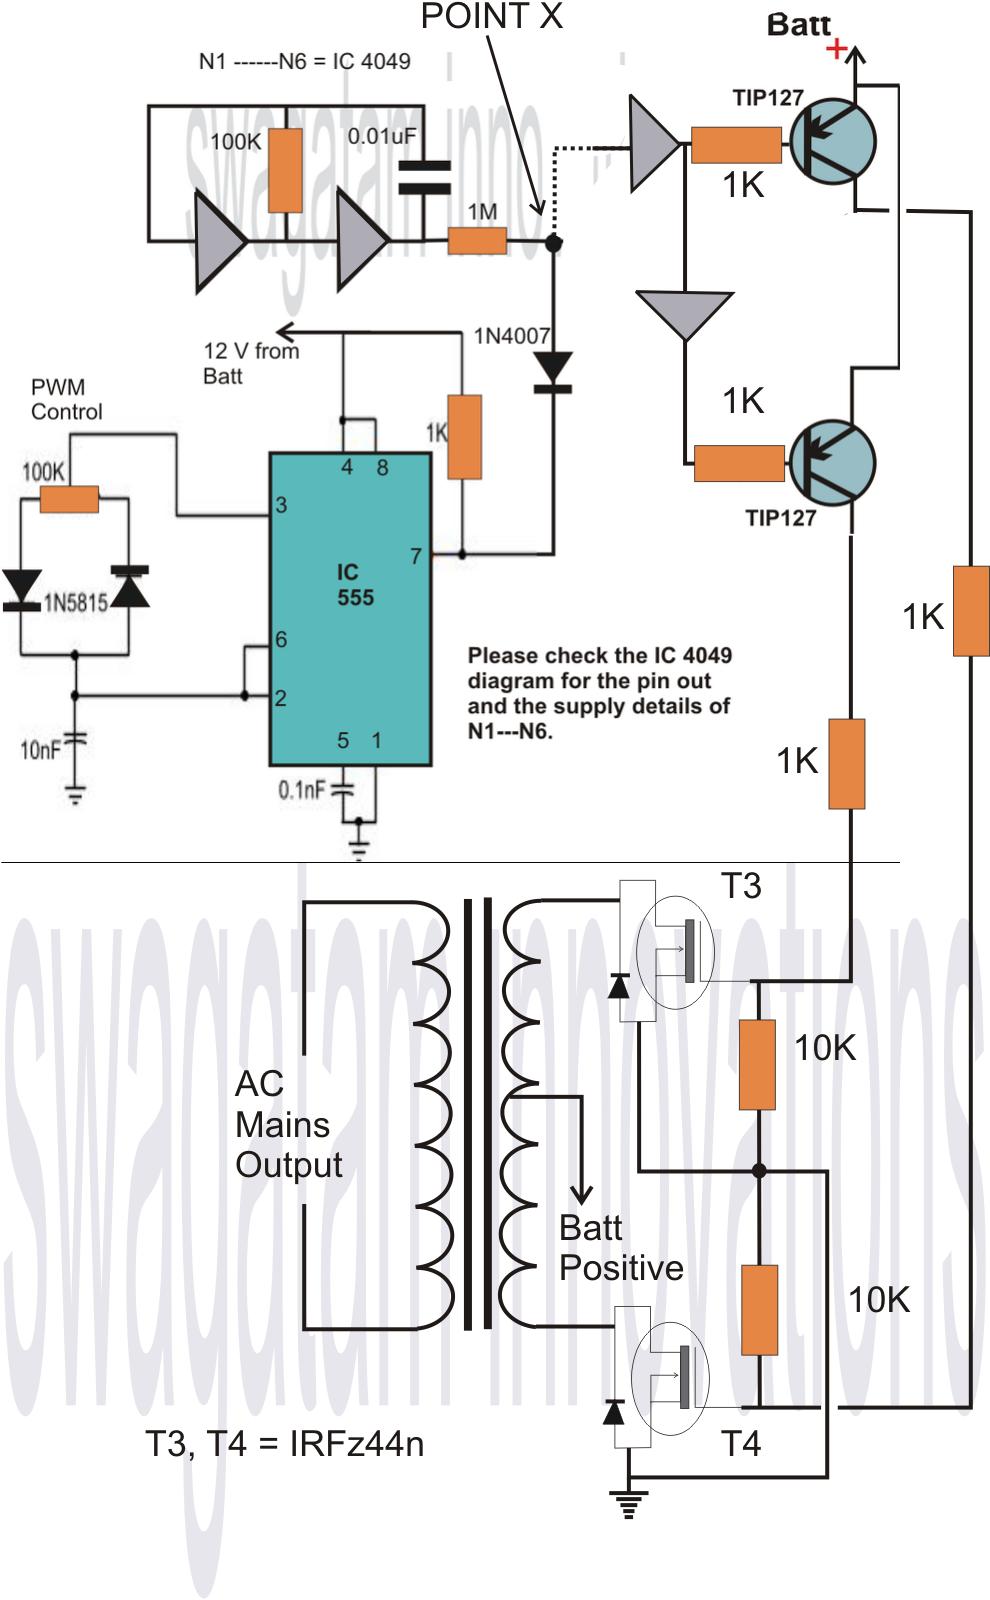 pj trailer plug wiring diagram voltmeter gauge inverter circuit 2000w – the readingrat.net